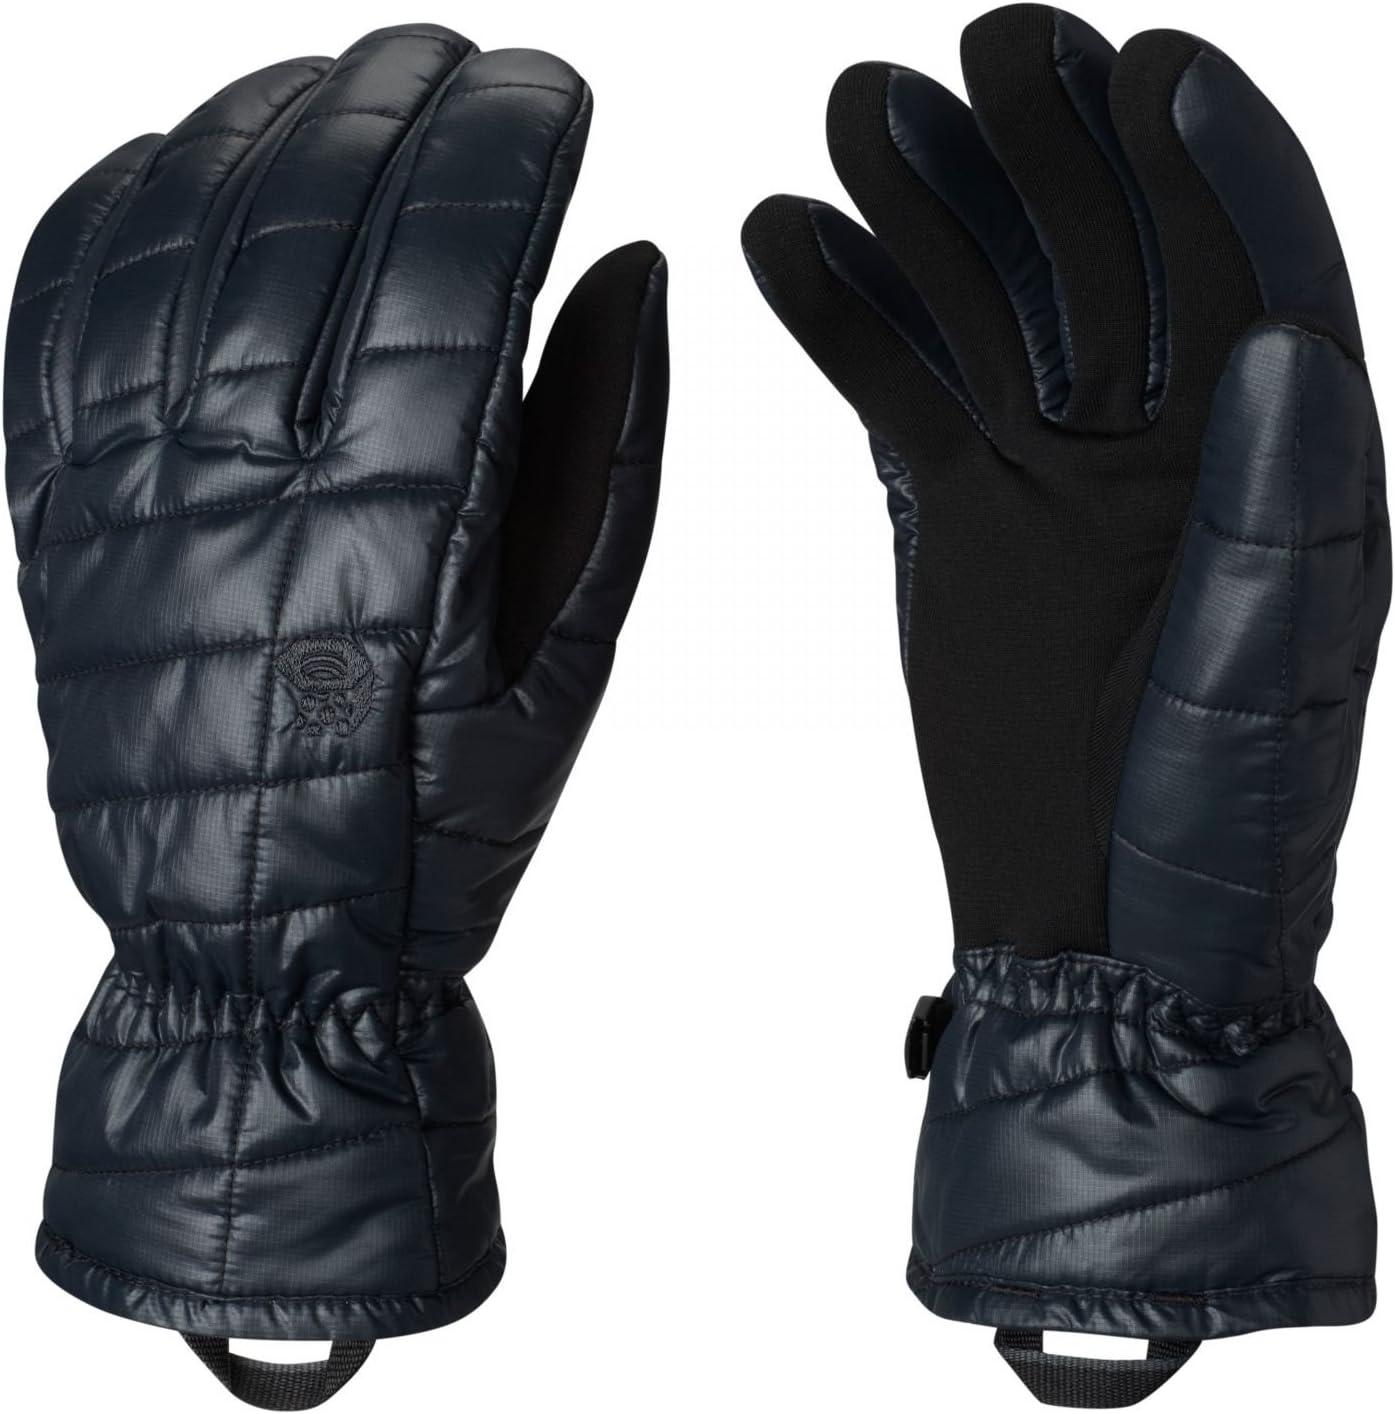 Mountain Hardwear Thermostatic Glove - Men's